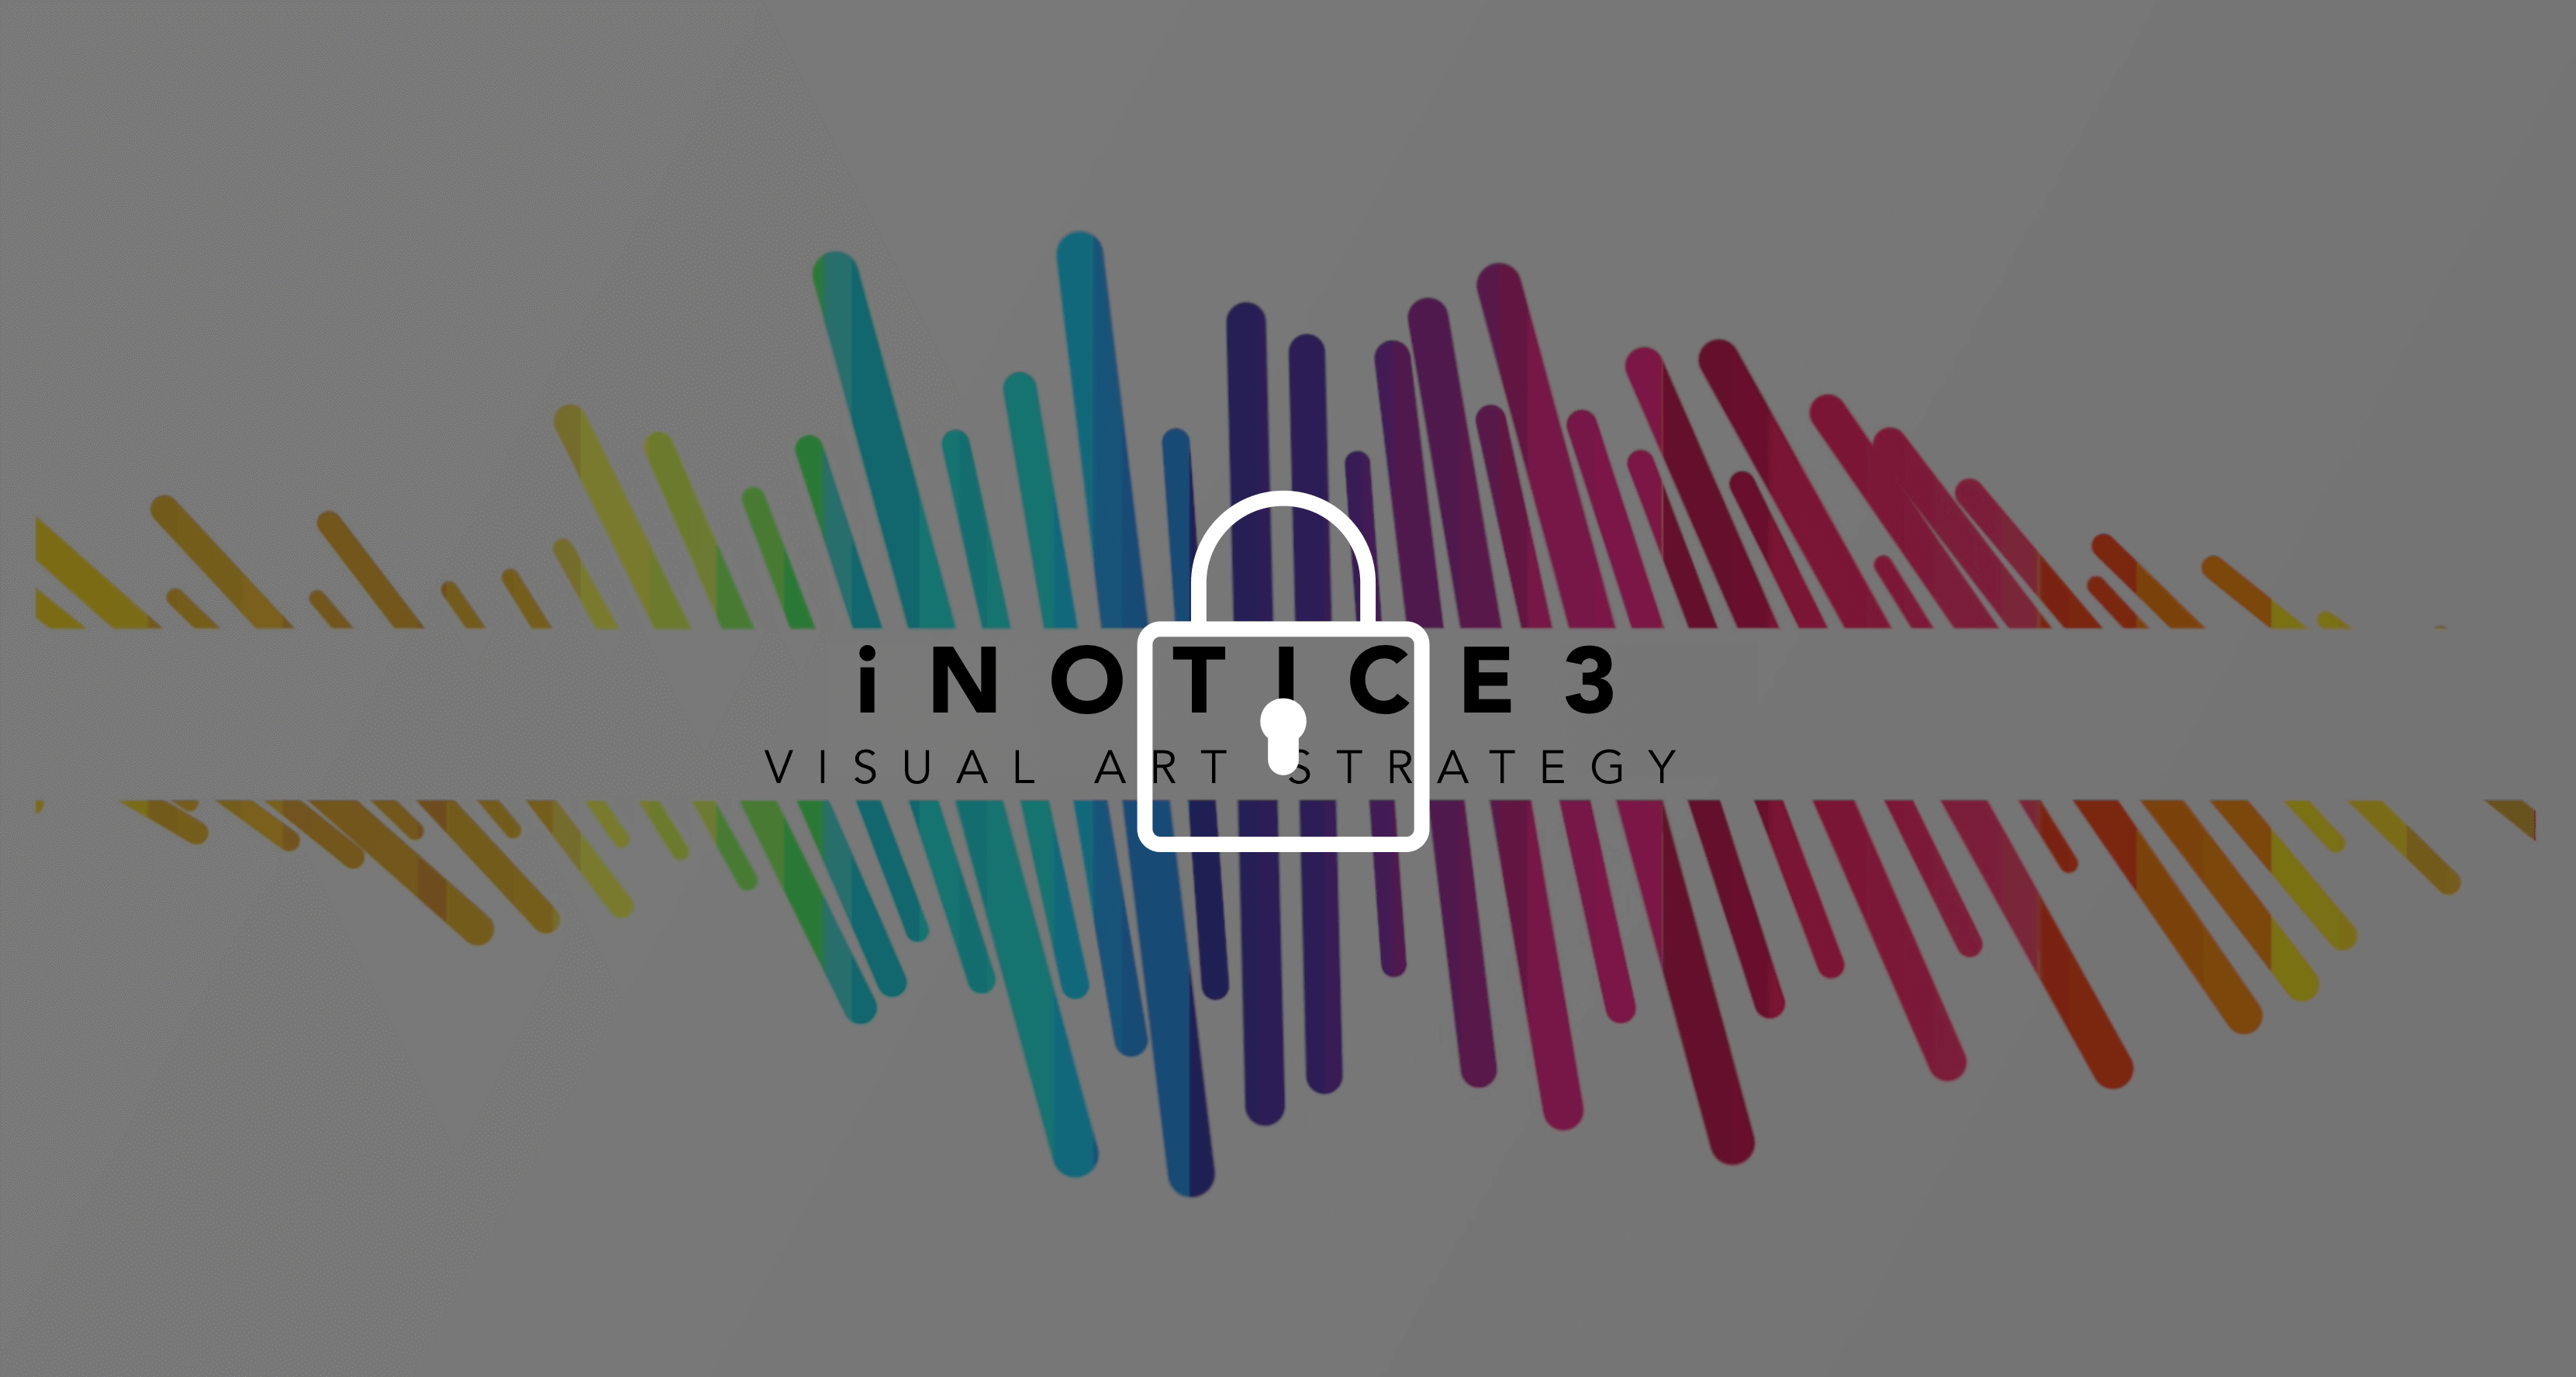 inotice3 strategy video